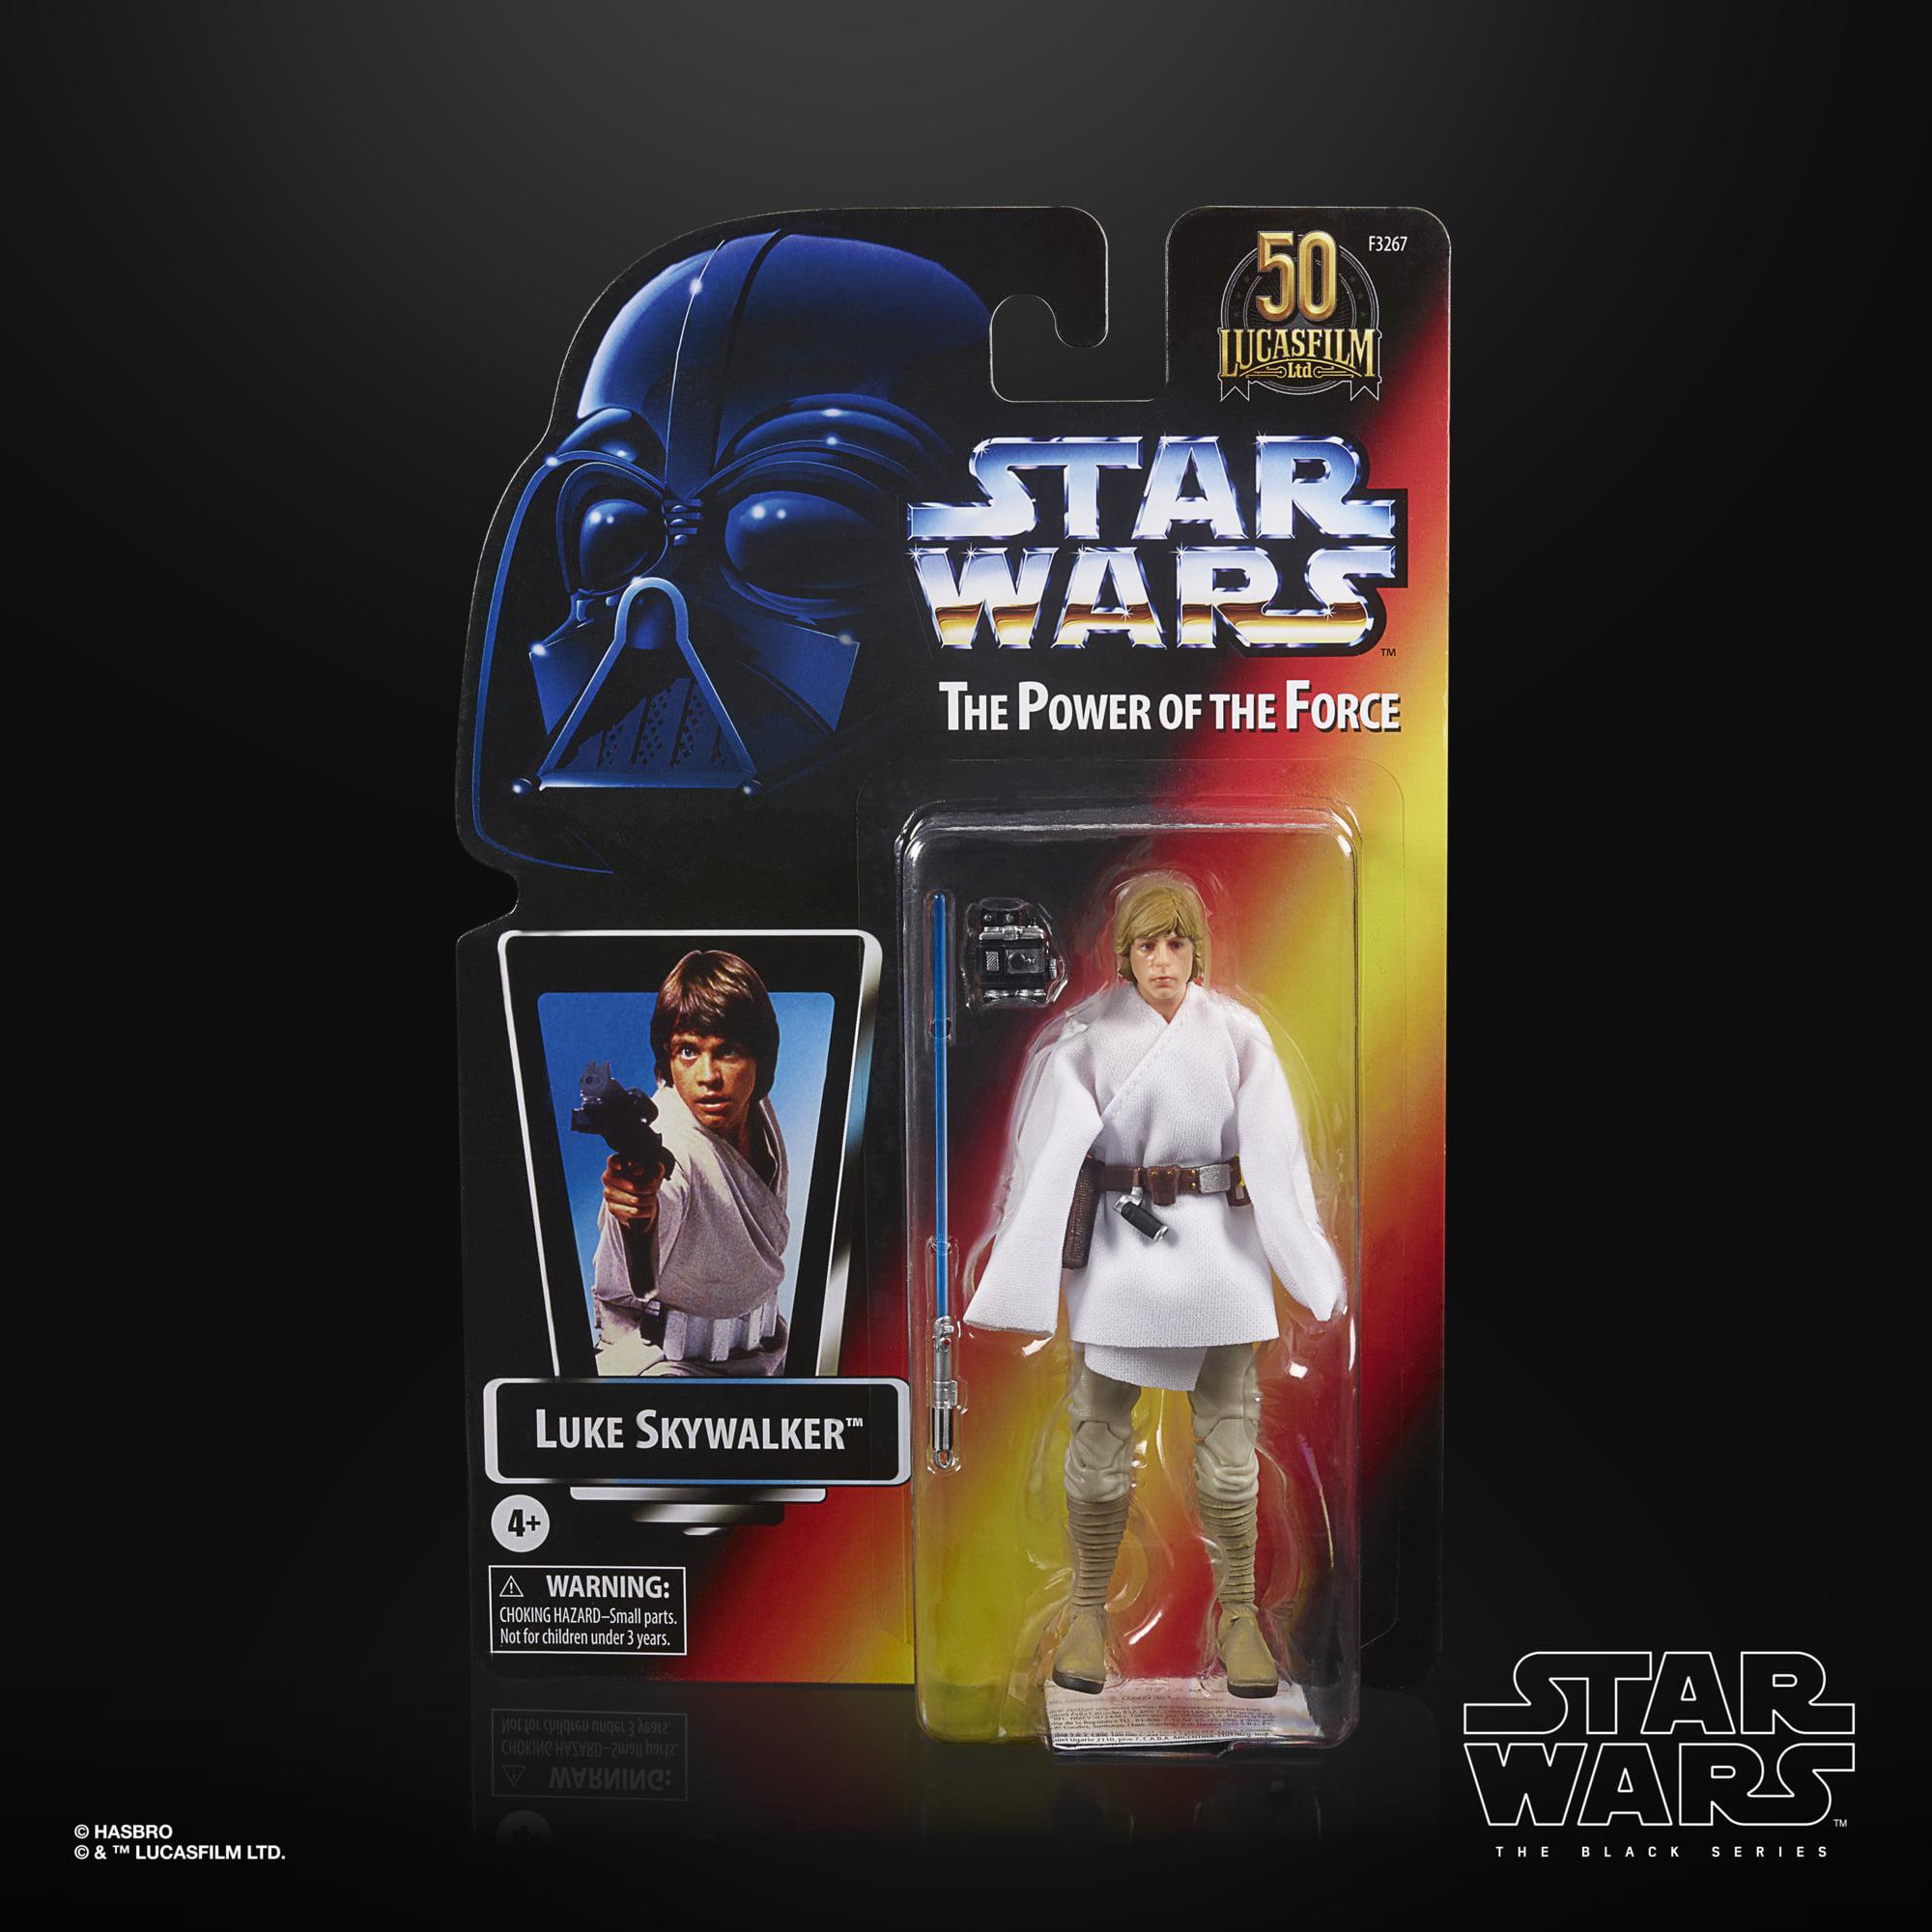 Star Wars The Black Series THE POWER OF THE FORCE - Luke Skywalker